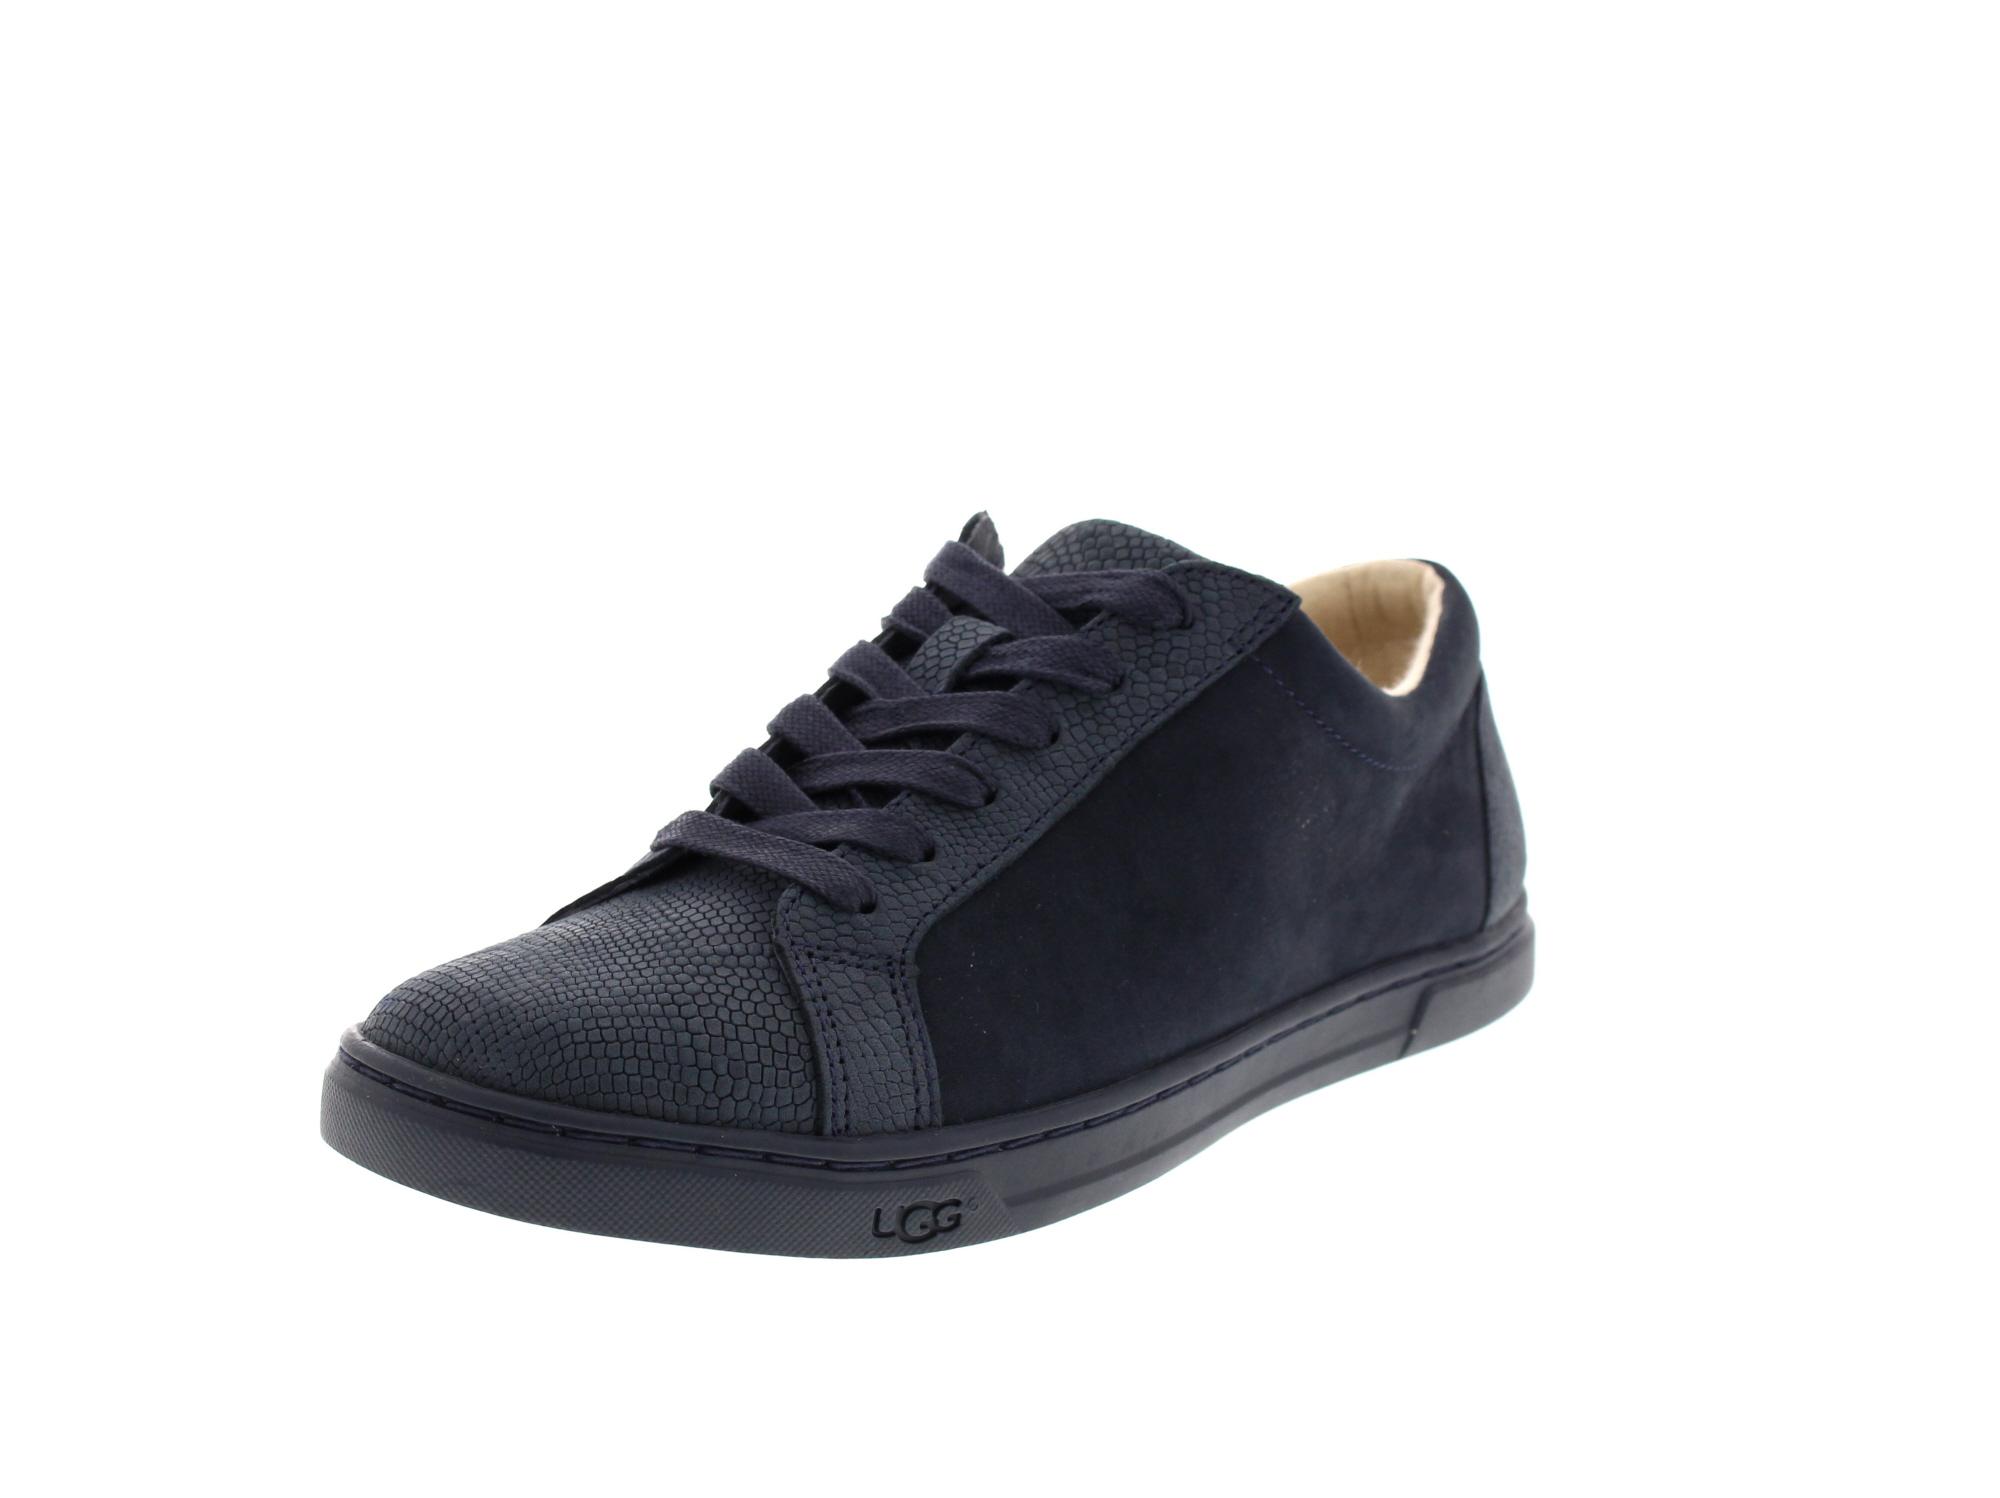 UGG Damenschuhe - Sneakers KARINE SNAKE 1015725 - navy-0